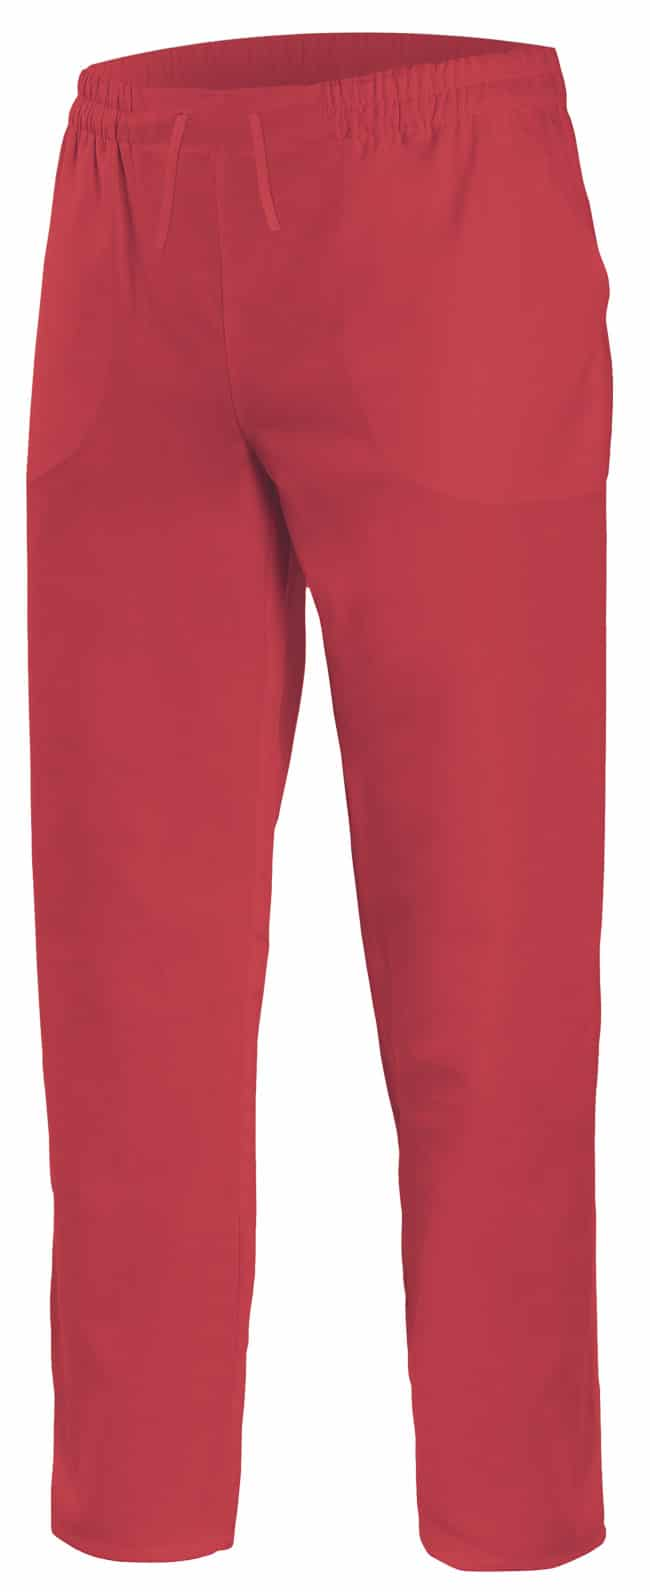 Velilla 533001 PantalÓn Pijama Con Cintas Rojo Coral